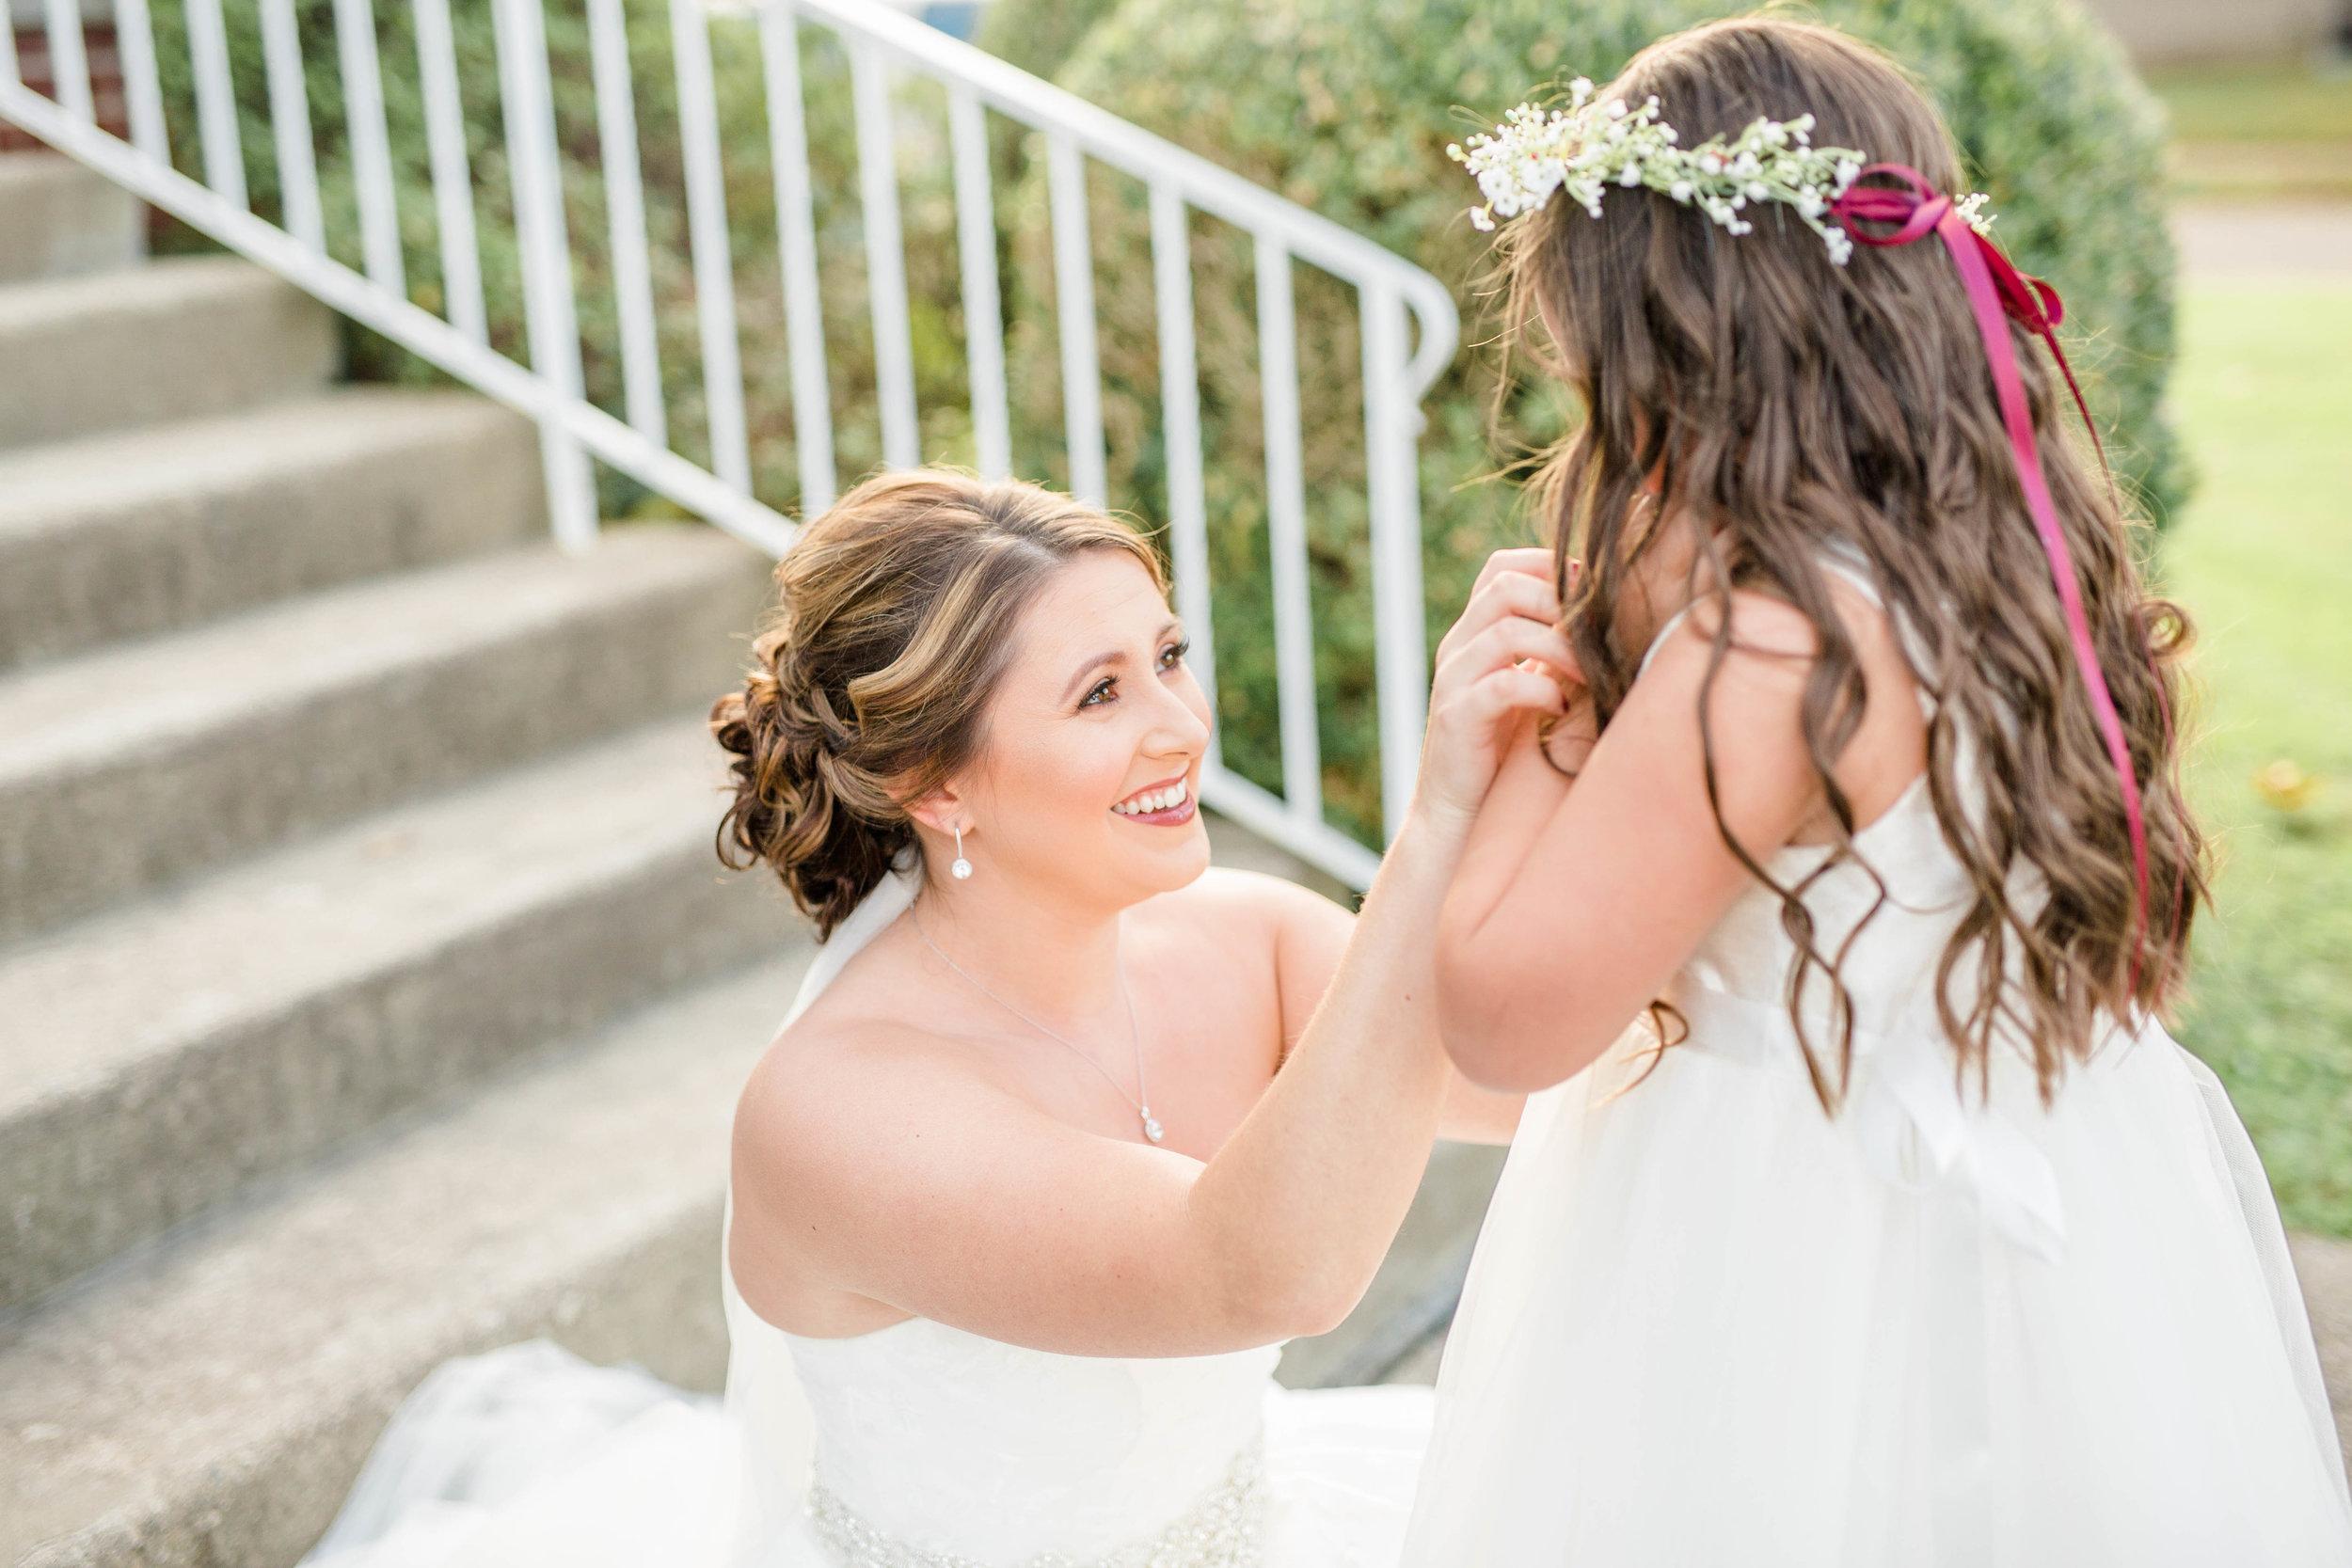 Hensel_Guyan_Country_Club_Wedding_Kara_Blakeman_Photography_2018_Huntington_West_Virginia-3275.jpg